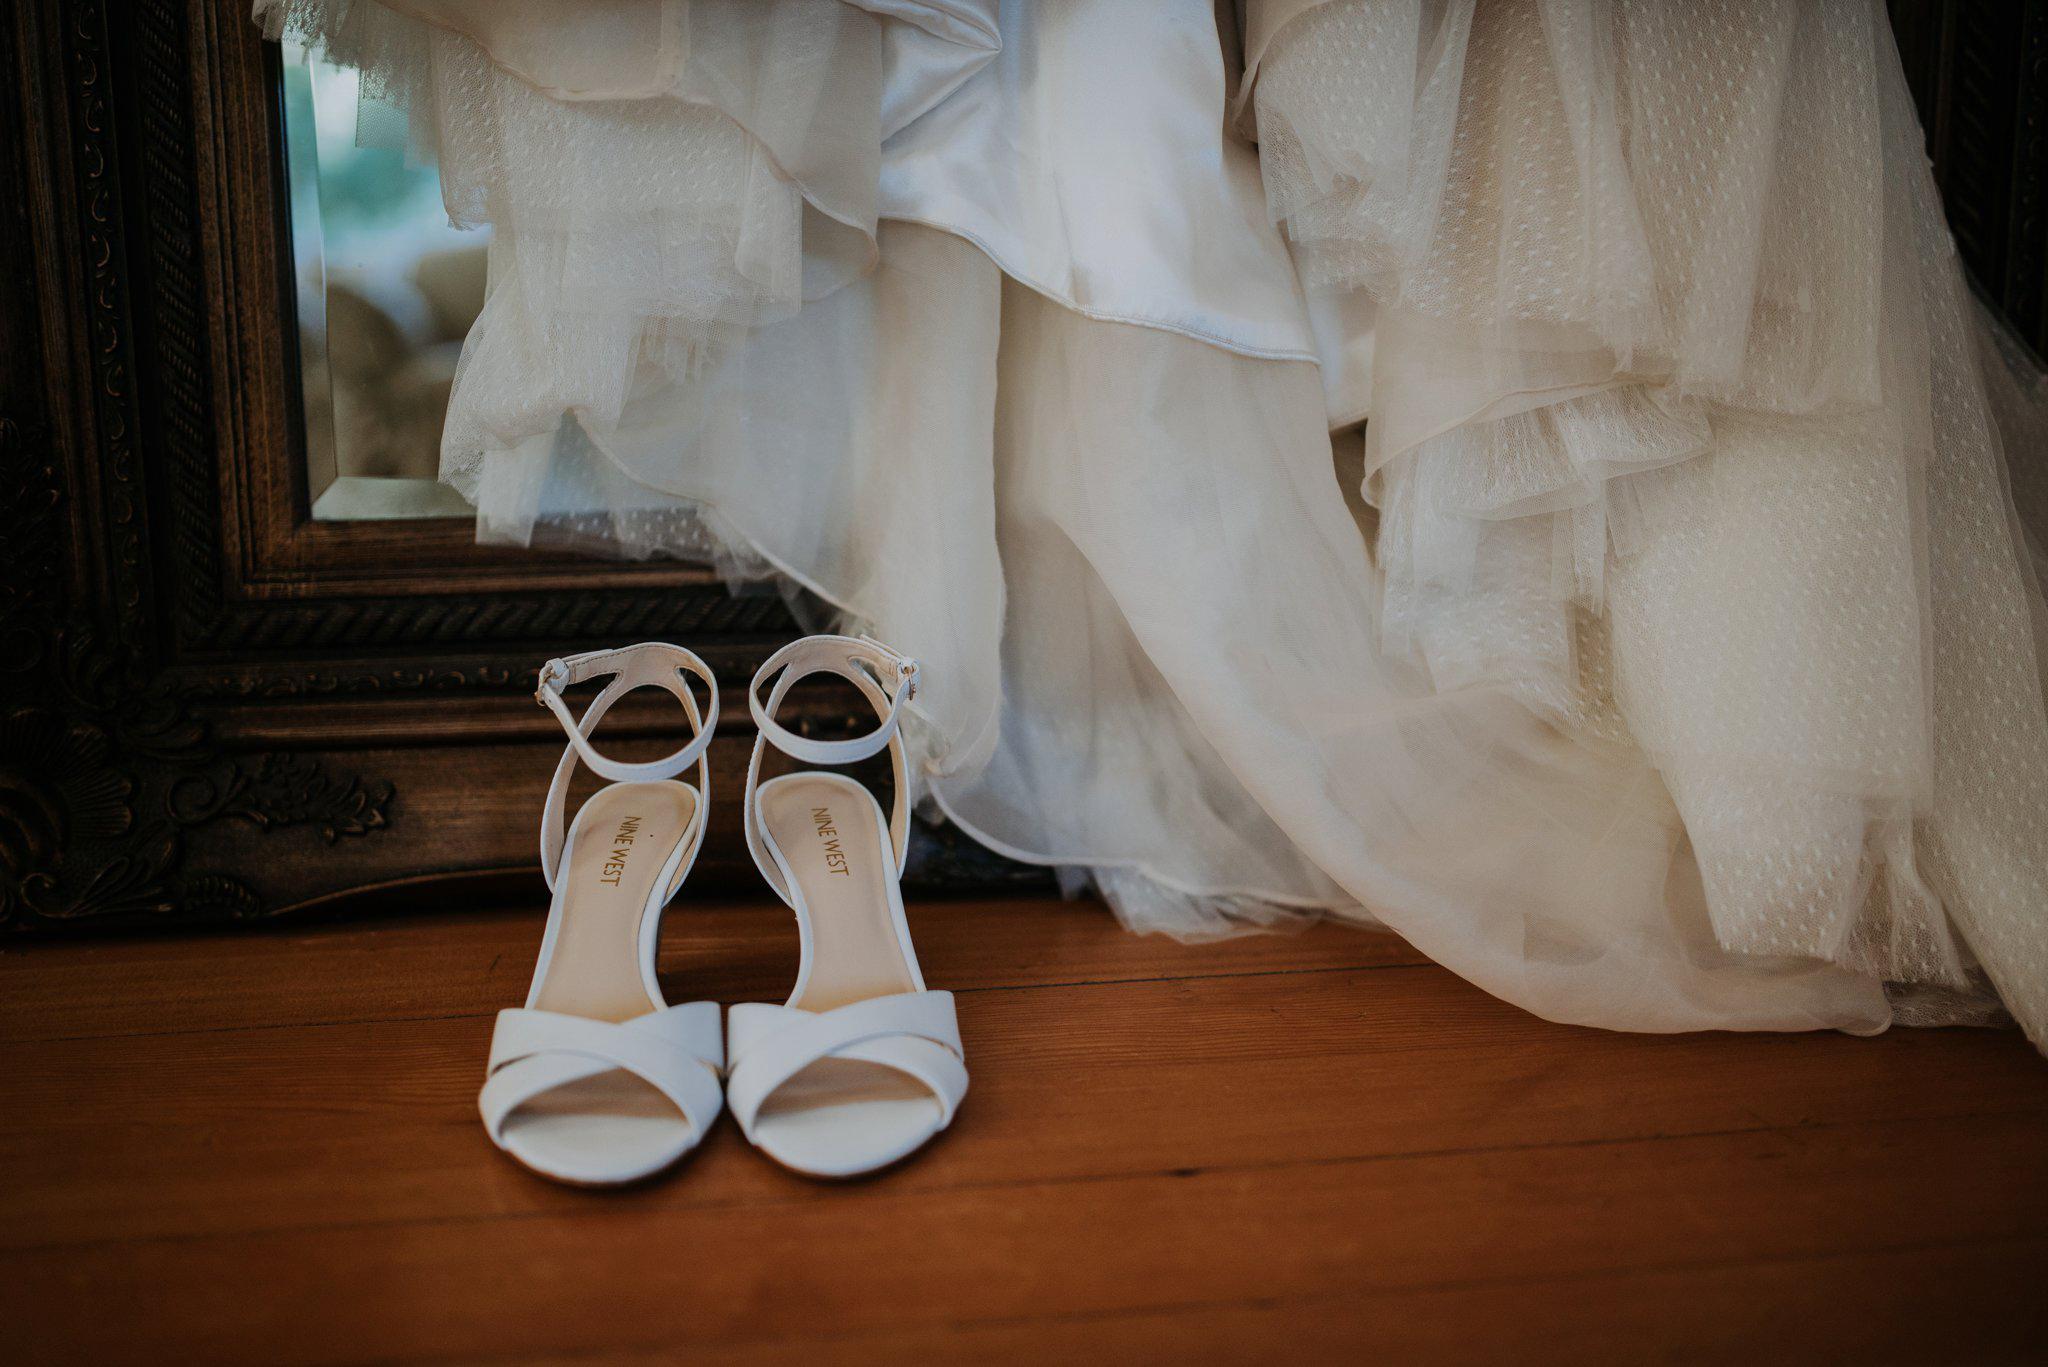 kristen-and-cody-the-kelley-farm-wedding-seattle-photographer-caitlyn-nikula-3.jpg